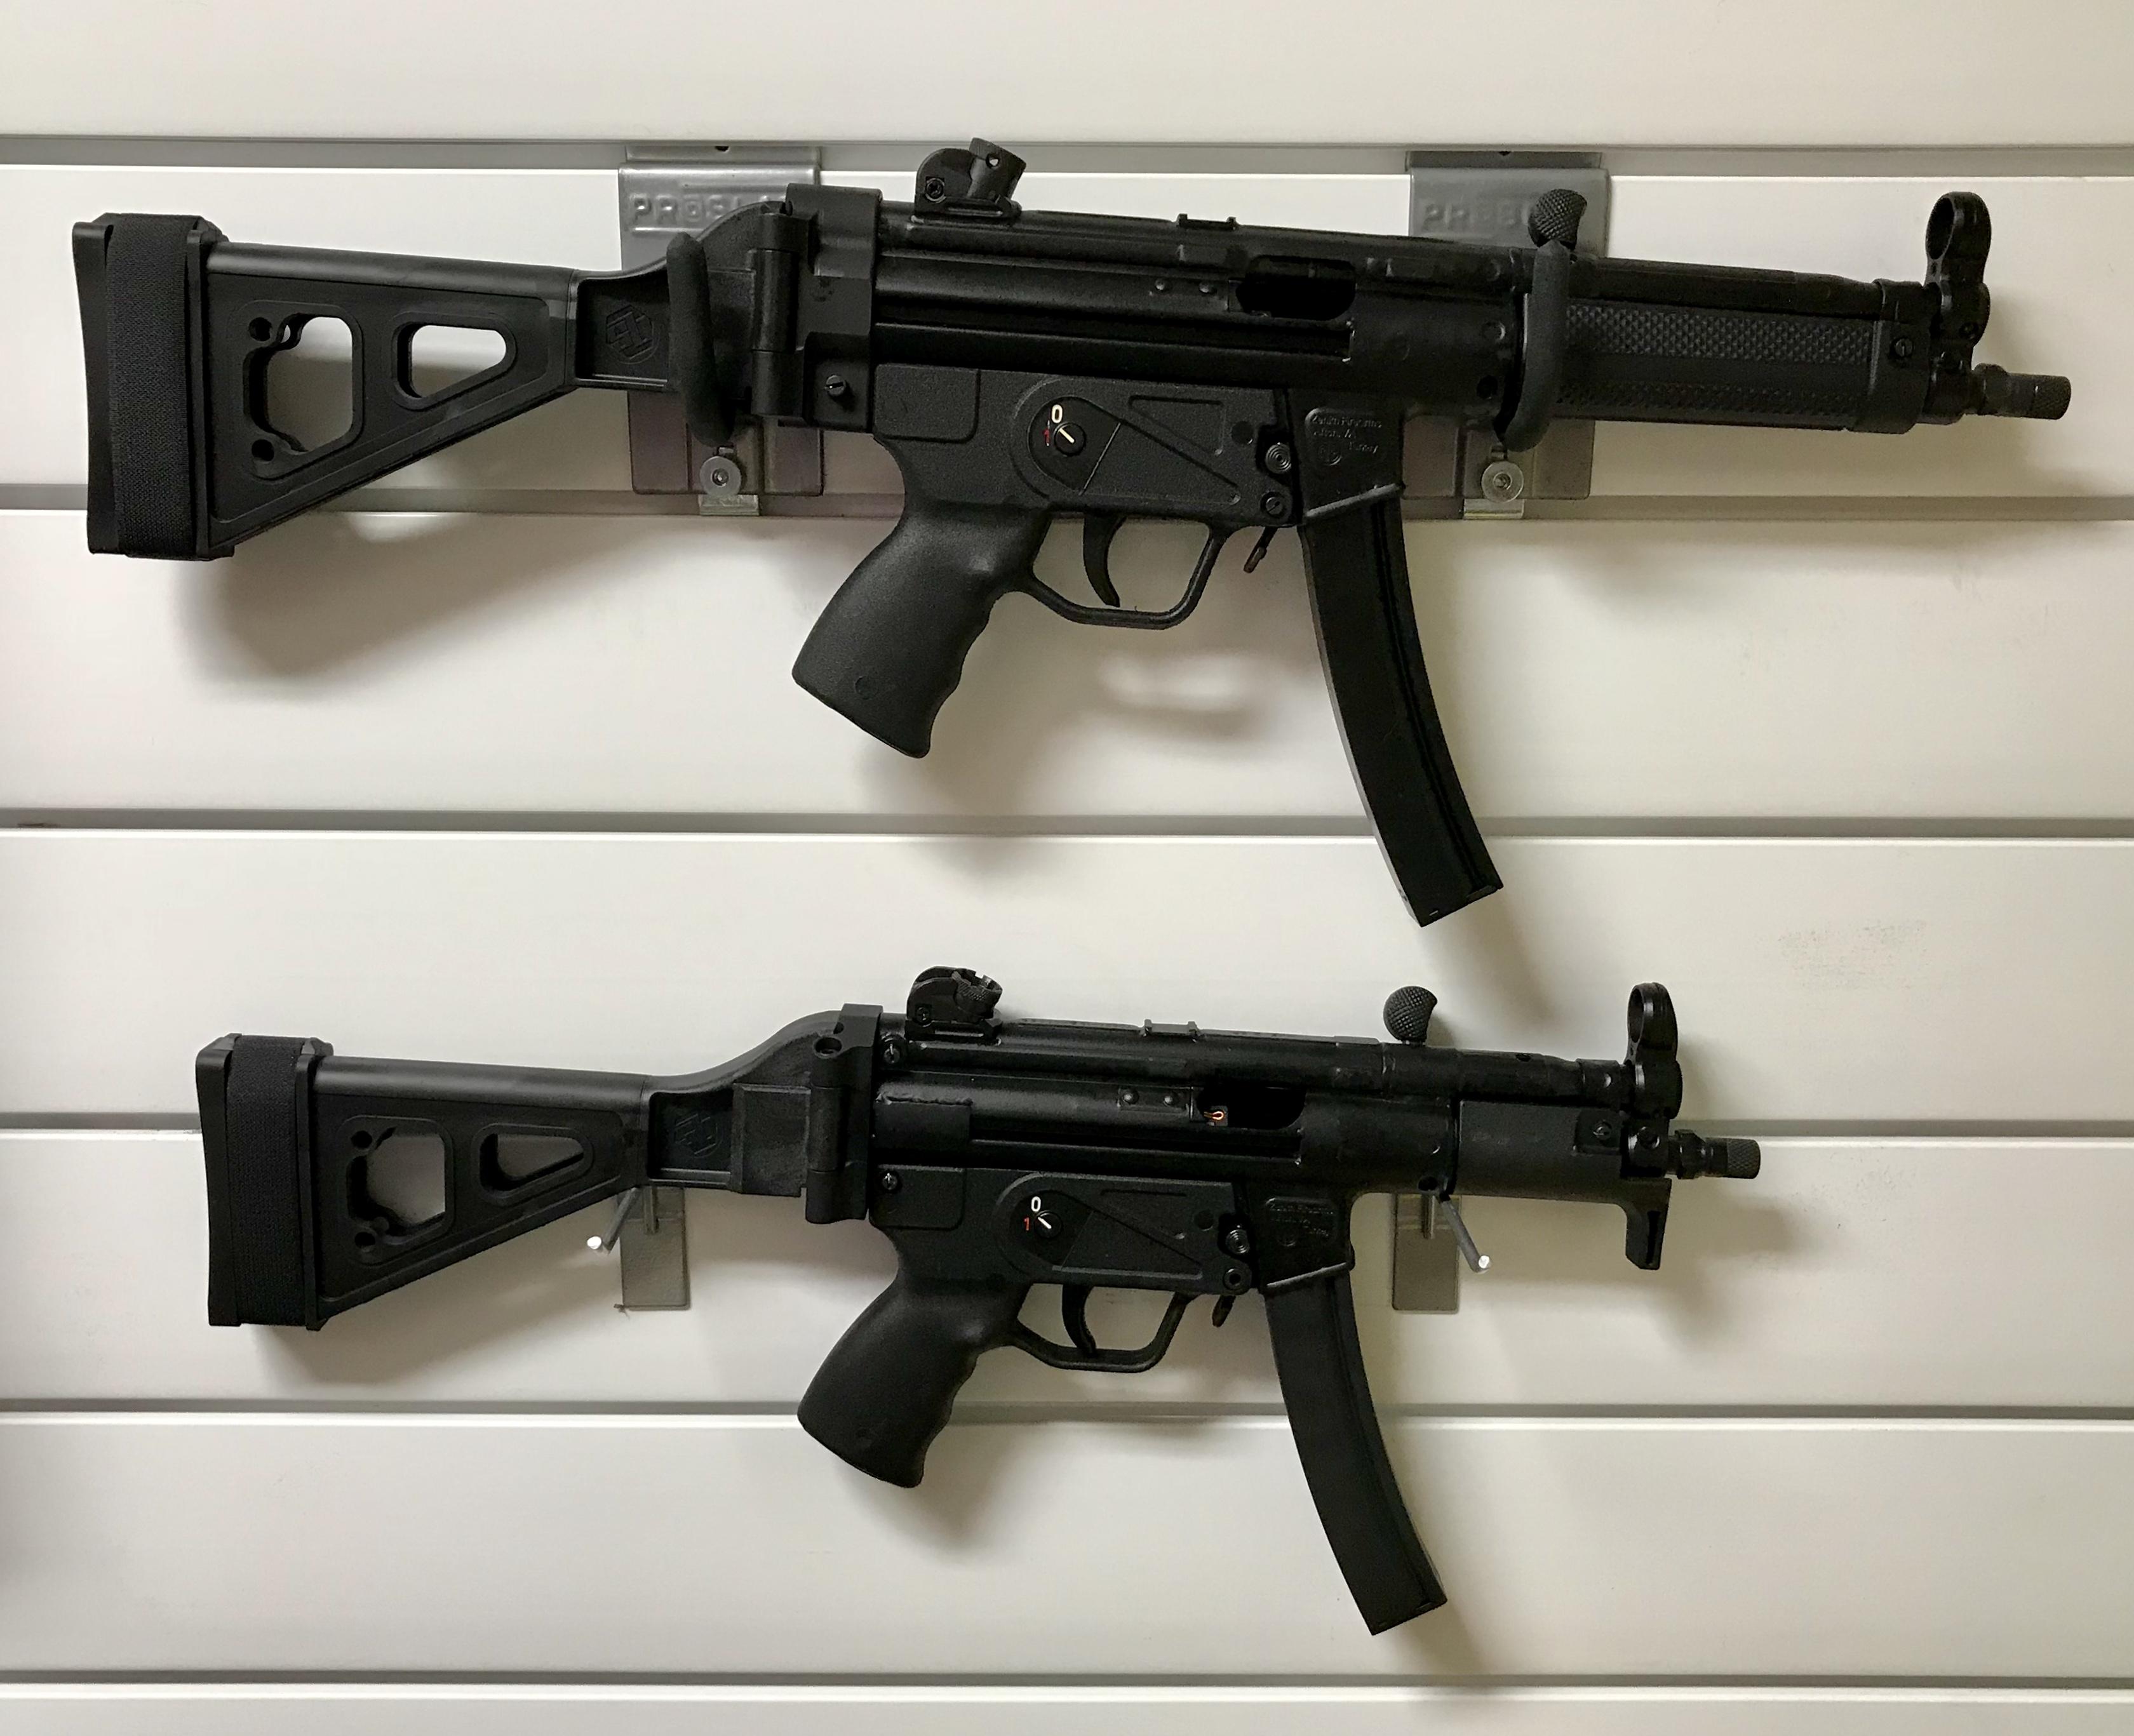 Are Zenith Z-5RS Pistol's still available?-cef1db66-9dba-44a2-b096-7cc444edc56d_1526237077451.jpeg